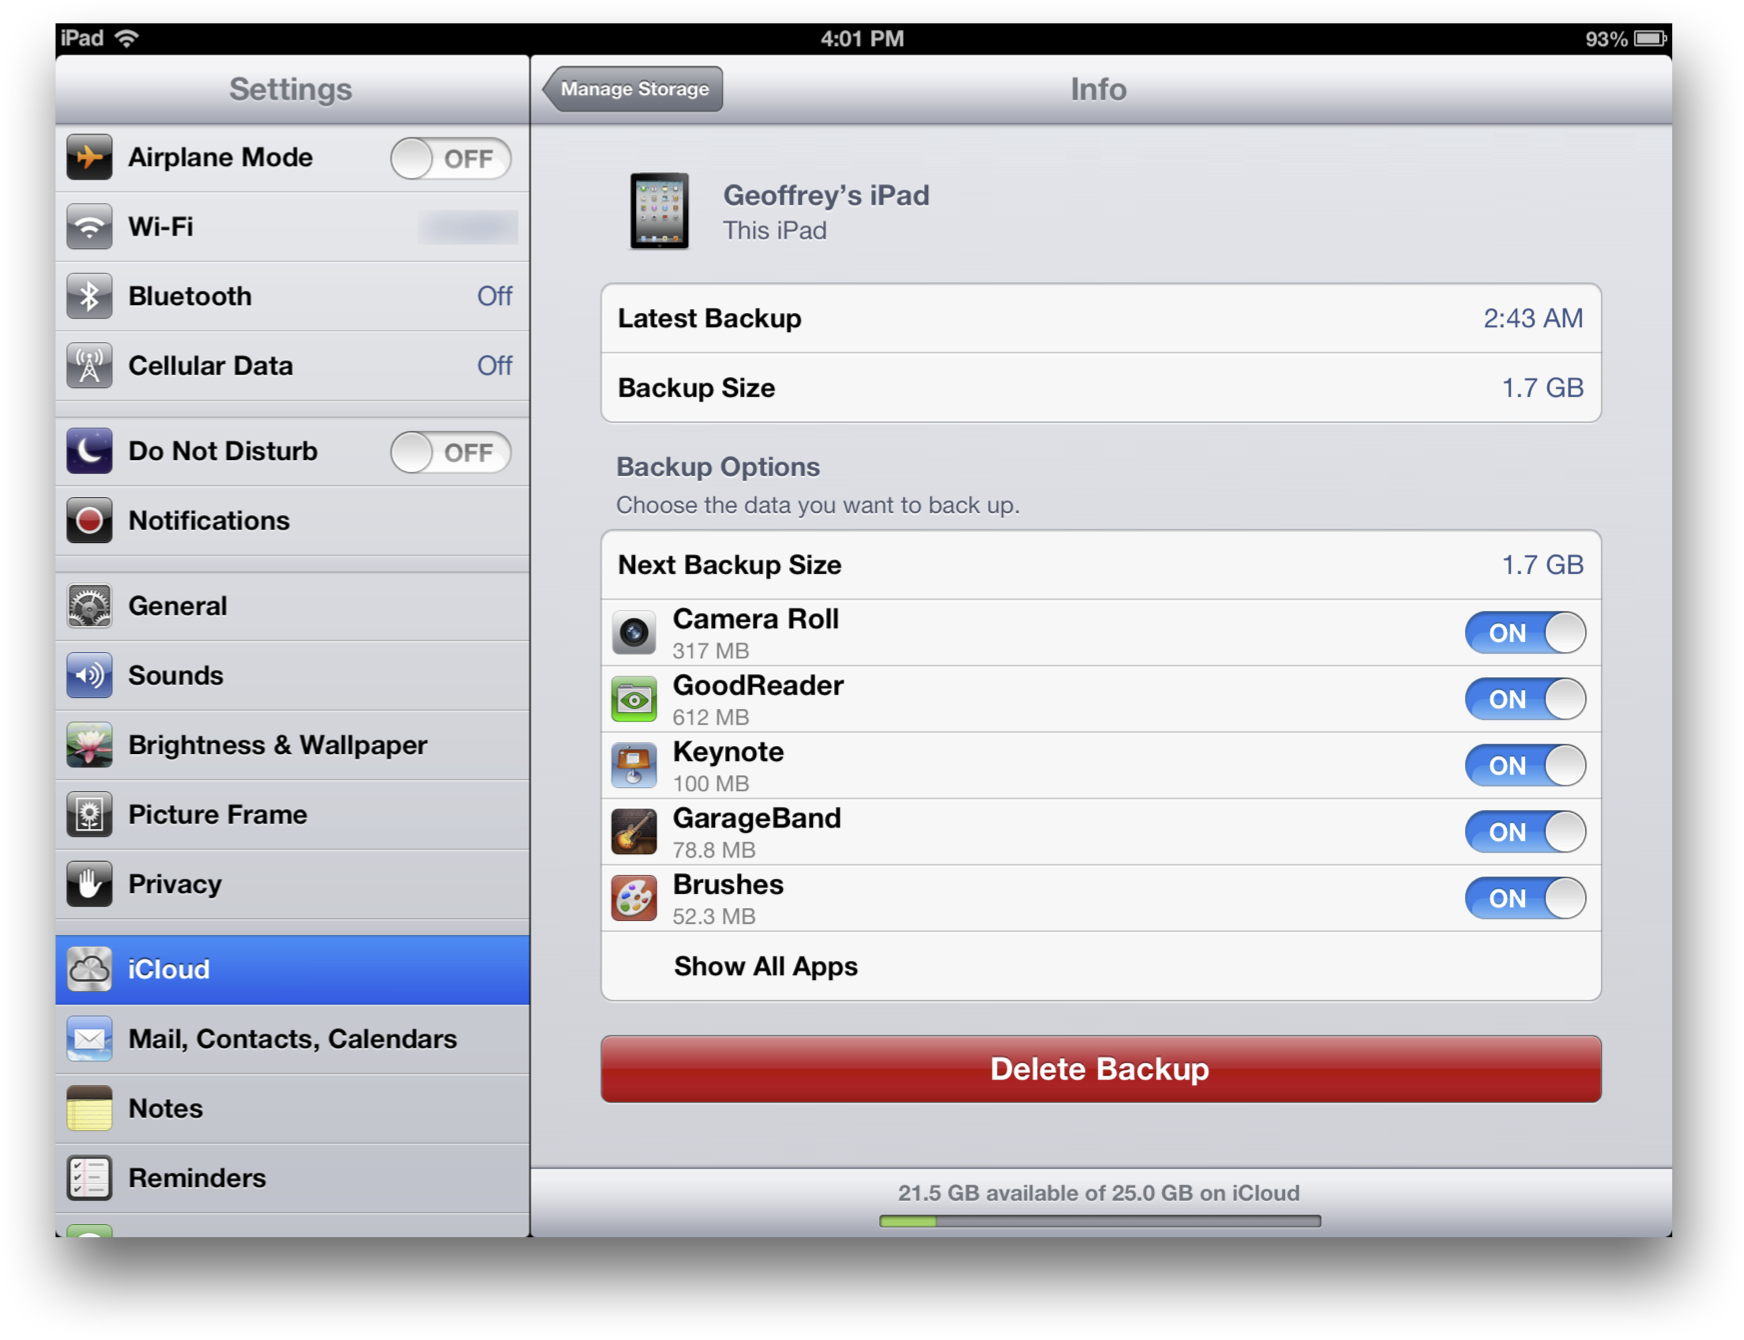 Individual App Backups